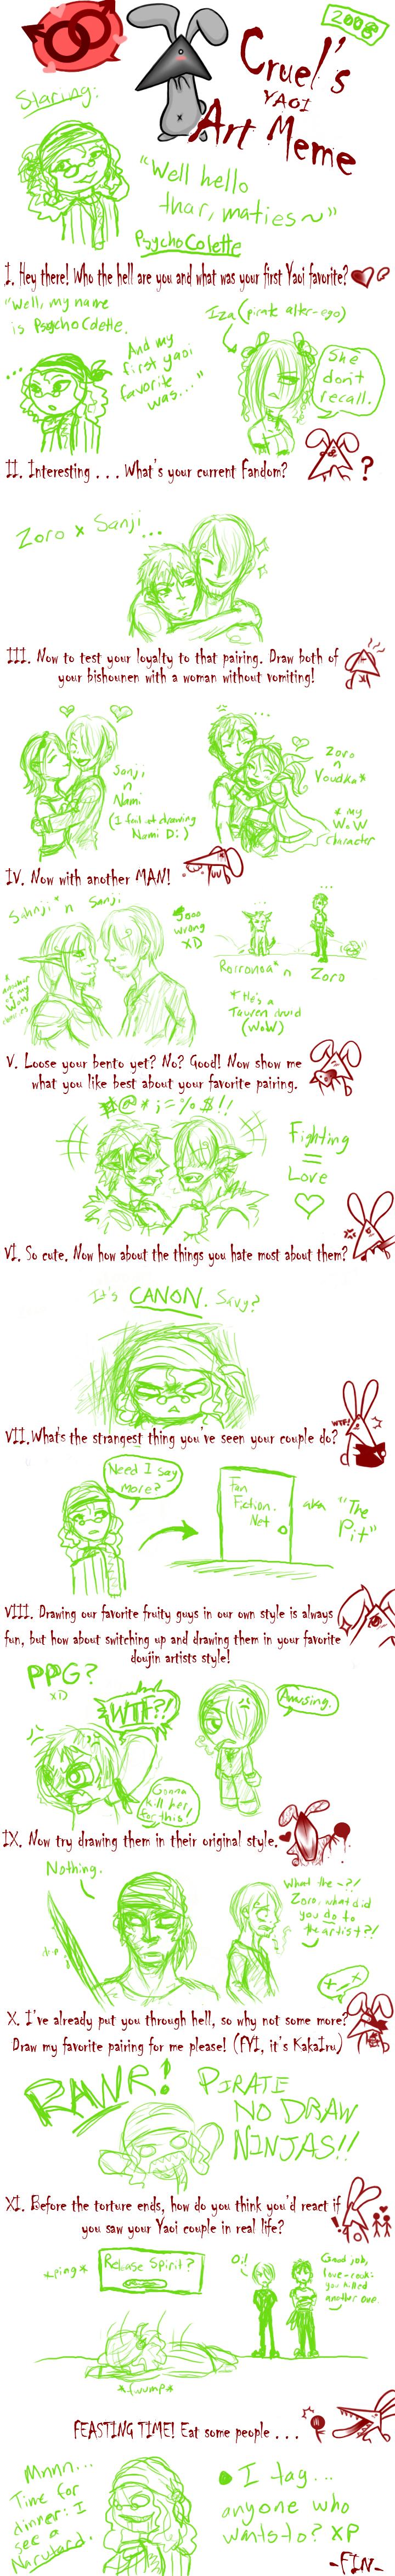 OP: Yaoi Meme by Whimsical-Realist